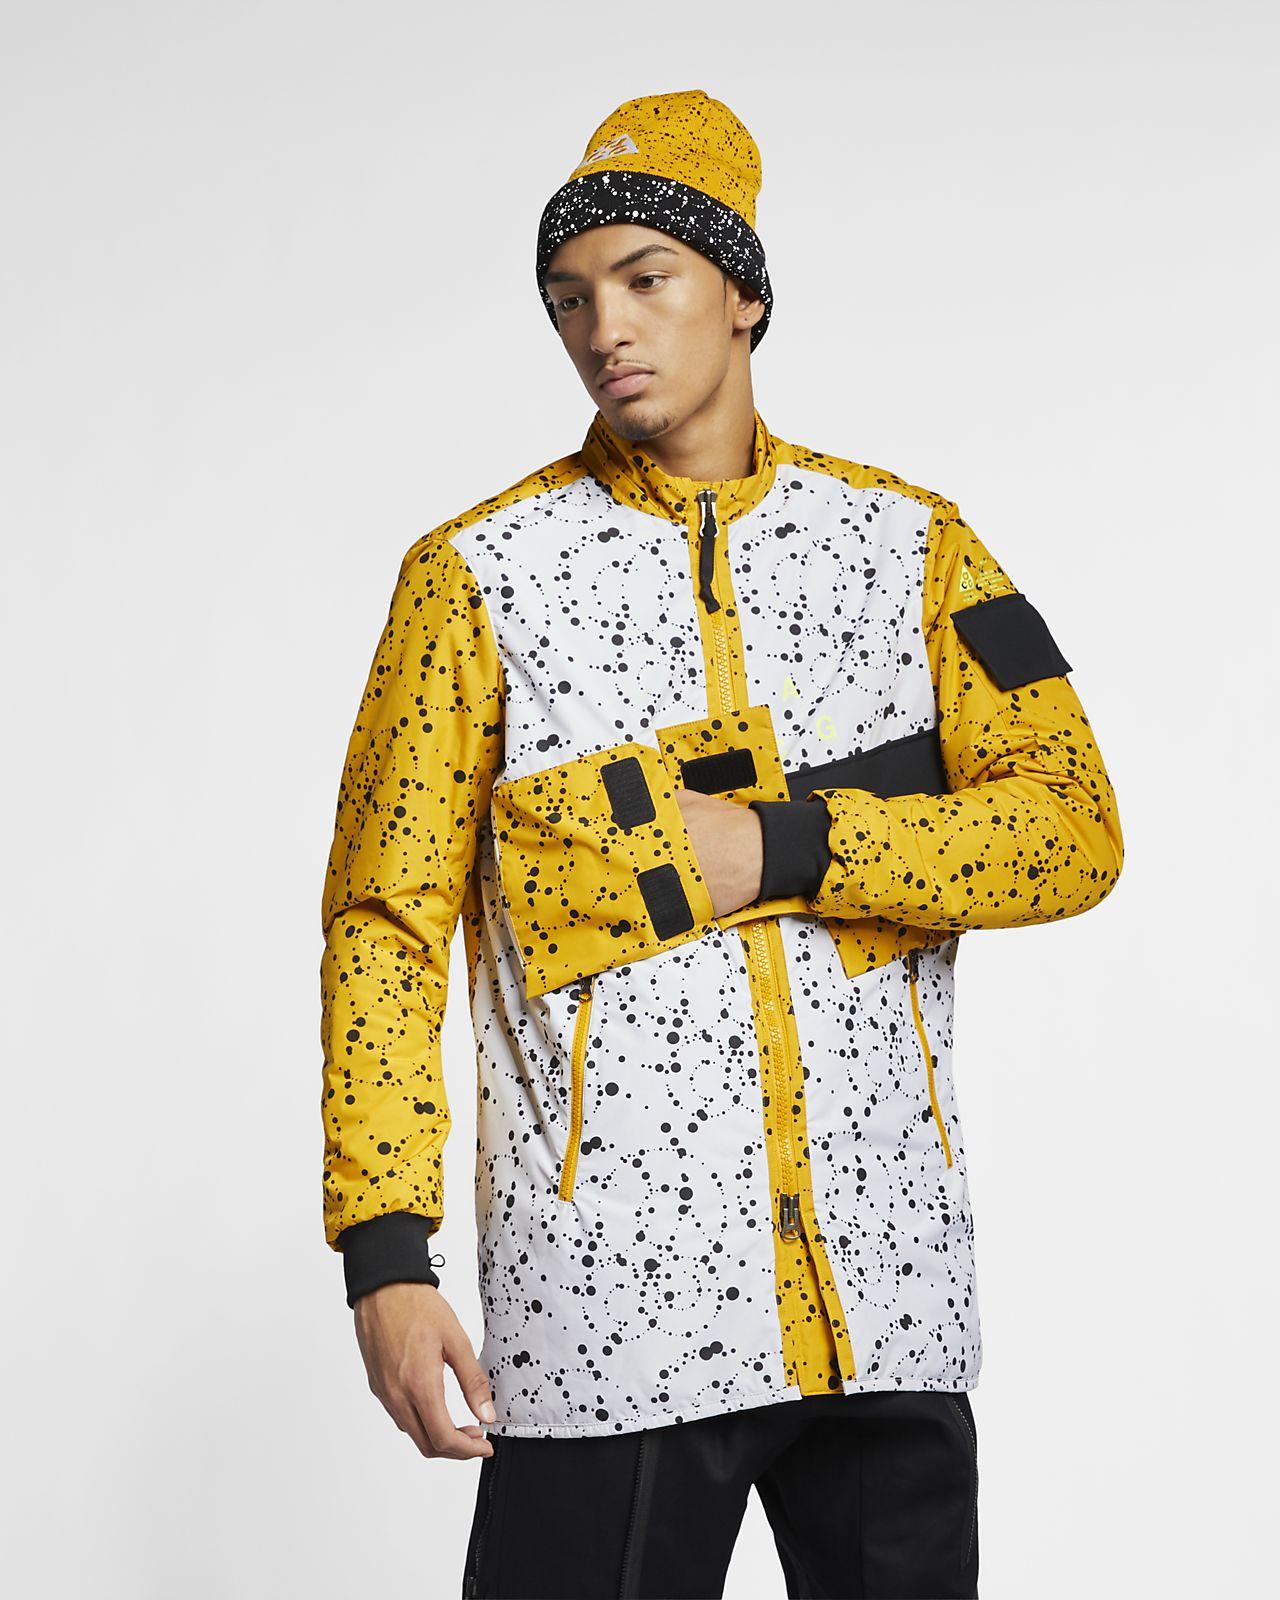 Pánská bunda NikeLab ACG s izolační vrstvou